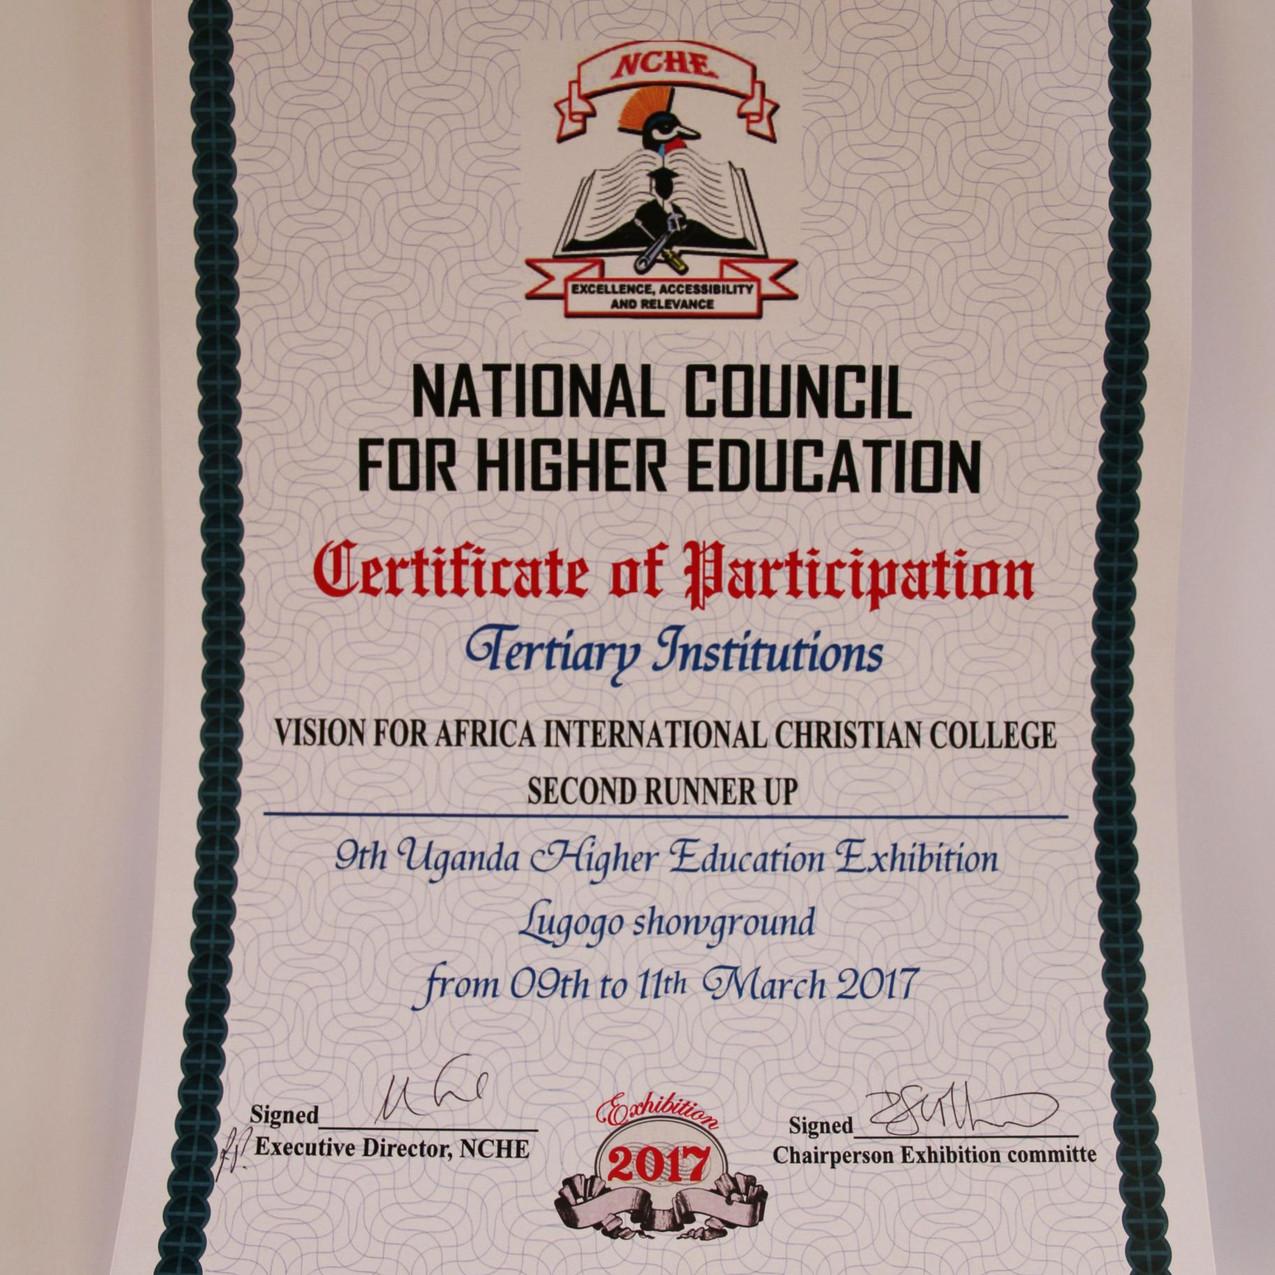 2. Platz Zertifikat